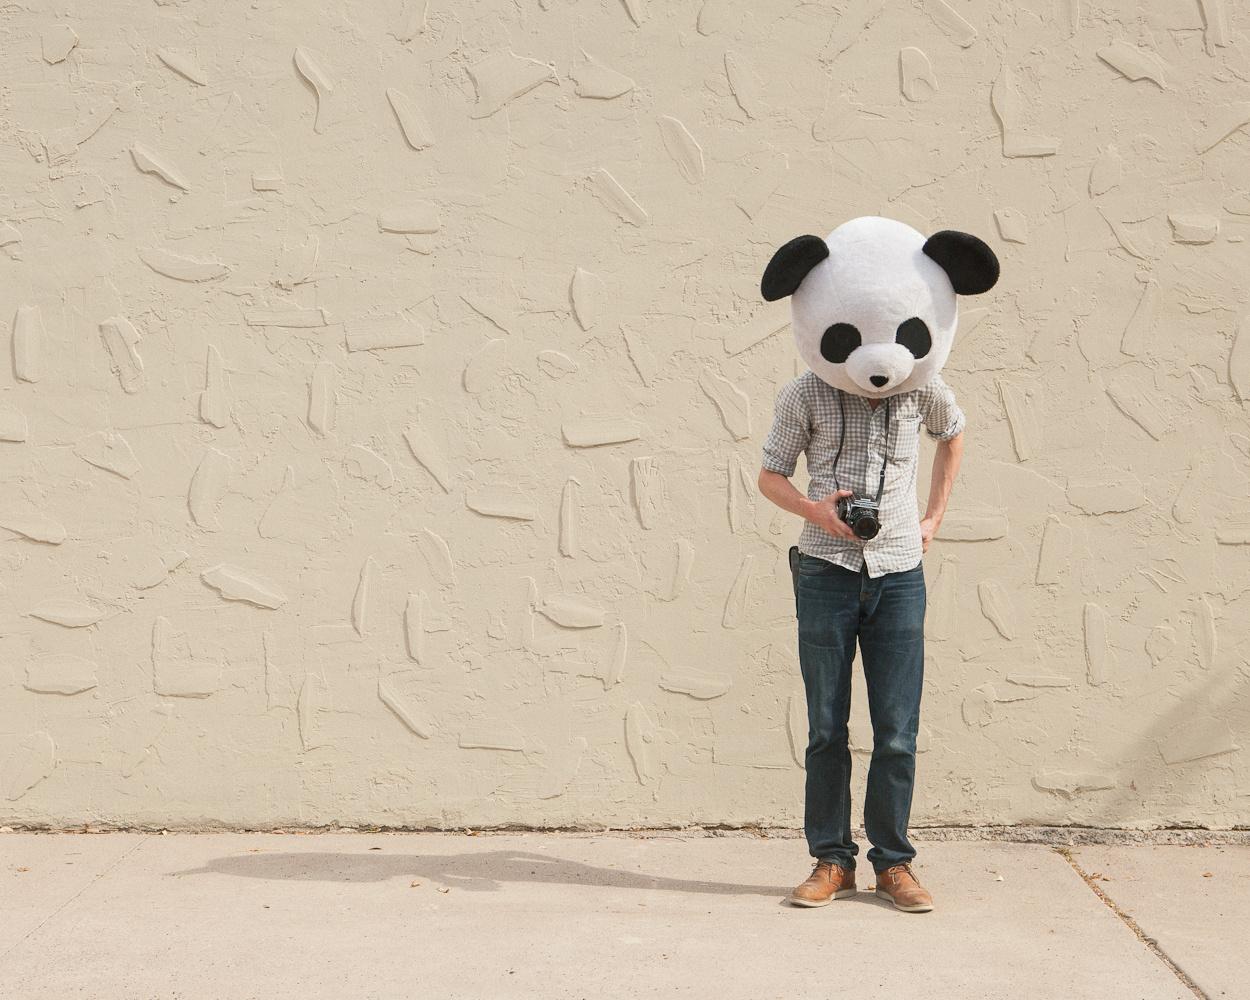 ©Cody Bratt - Animalia Obscura. Fotografía | Photography